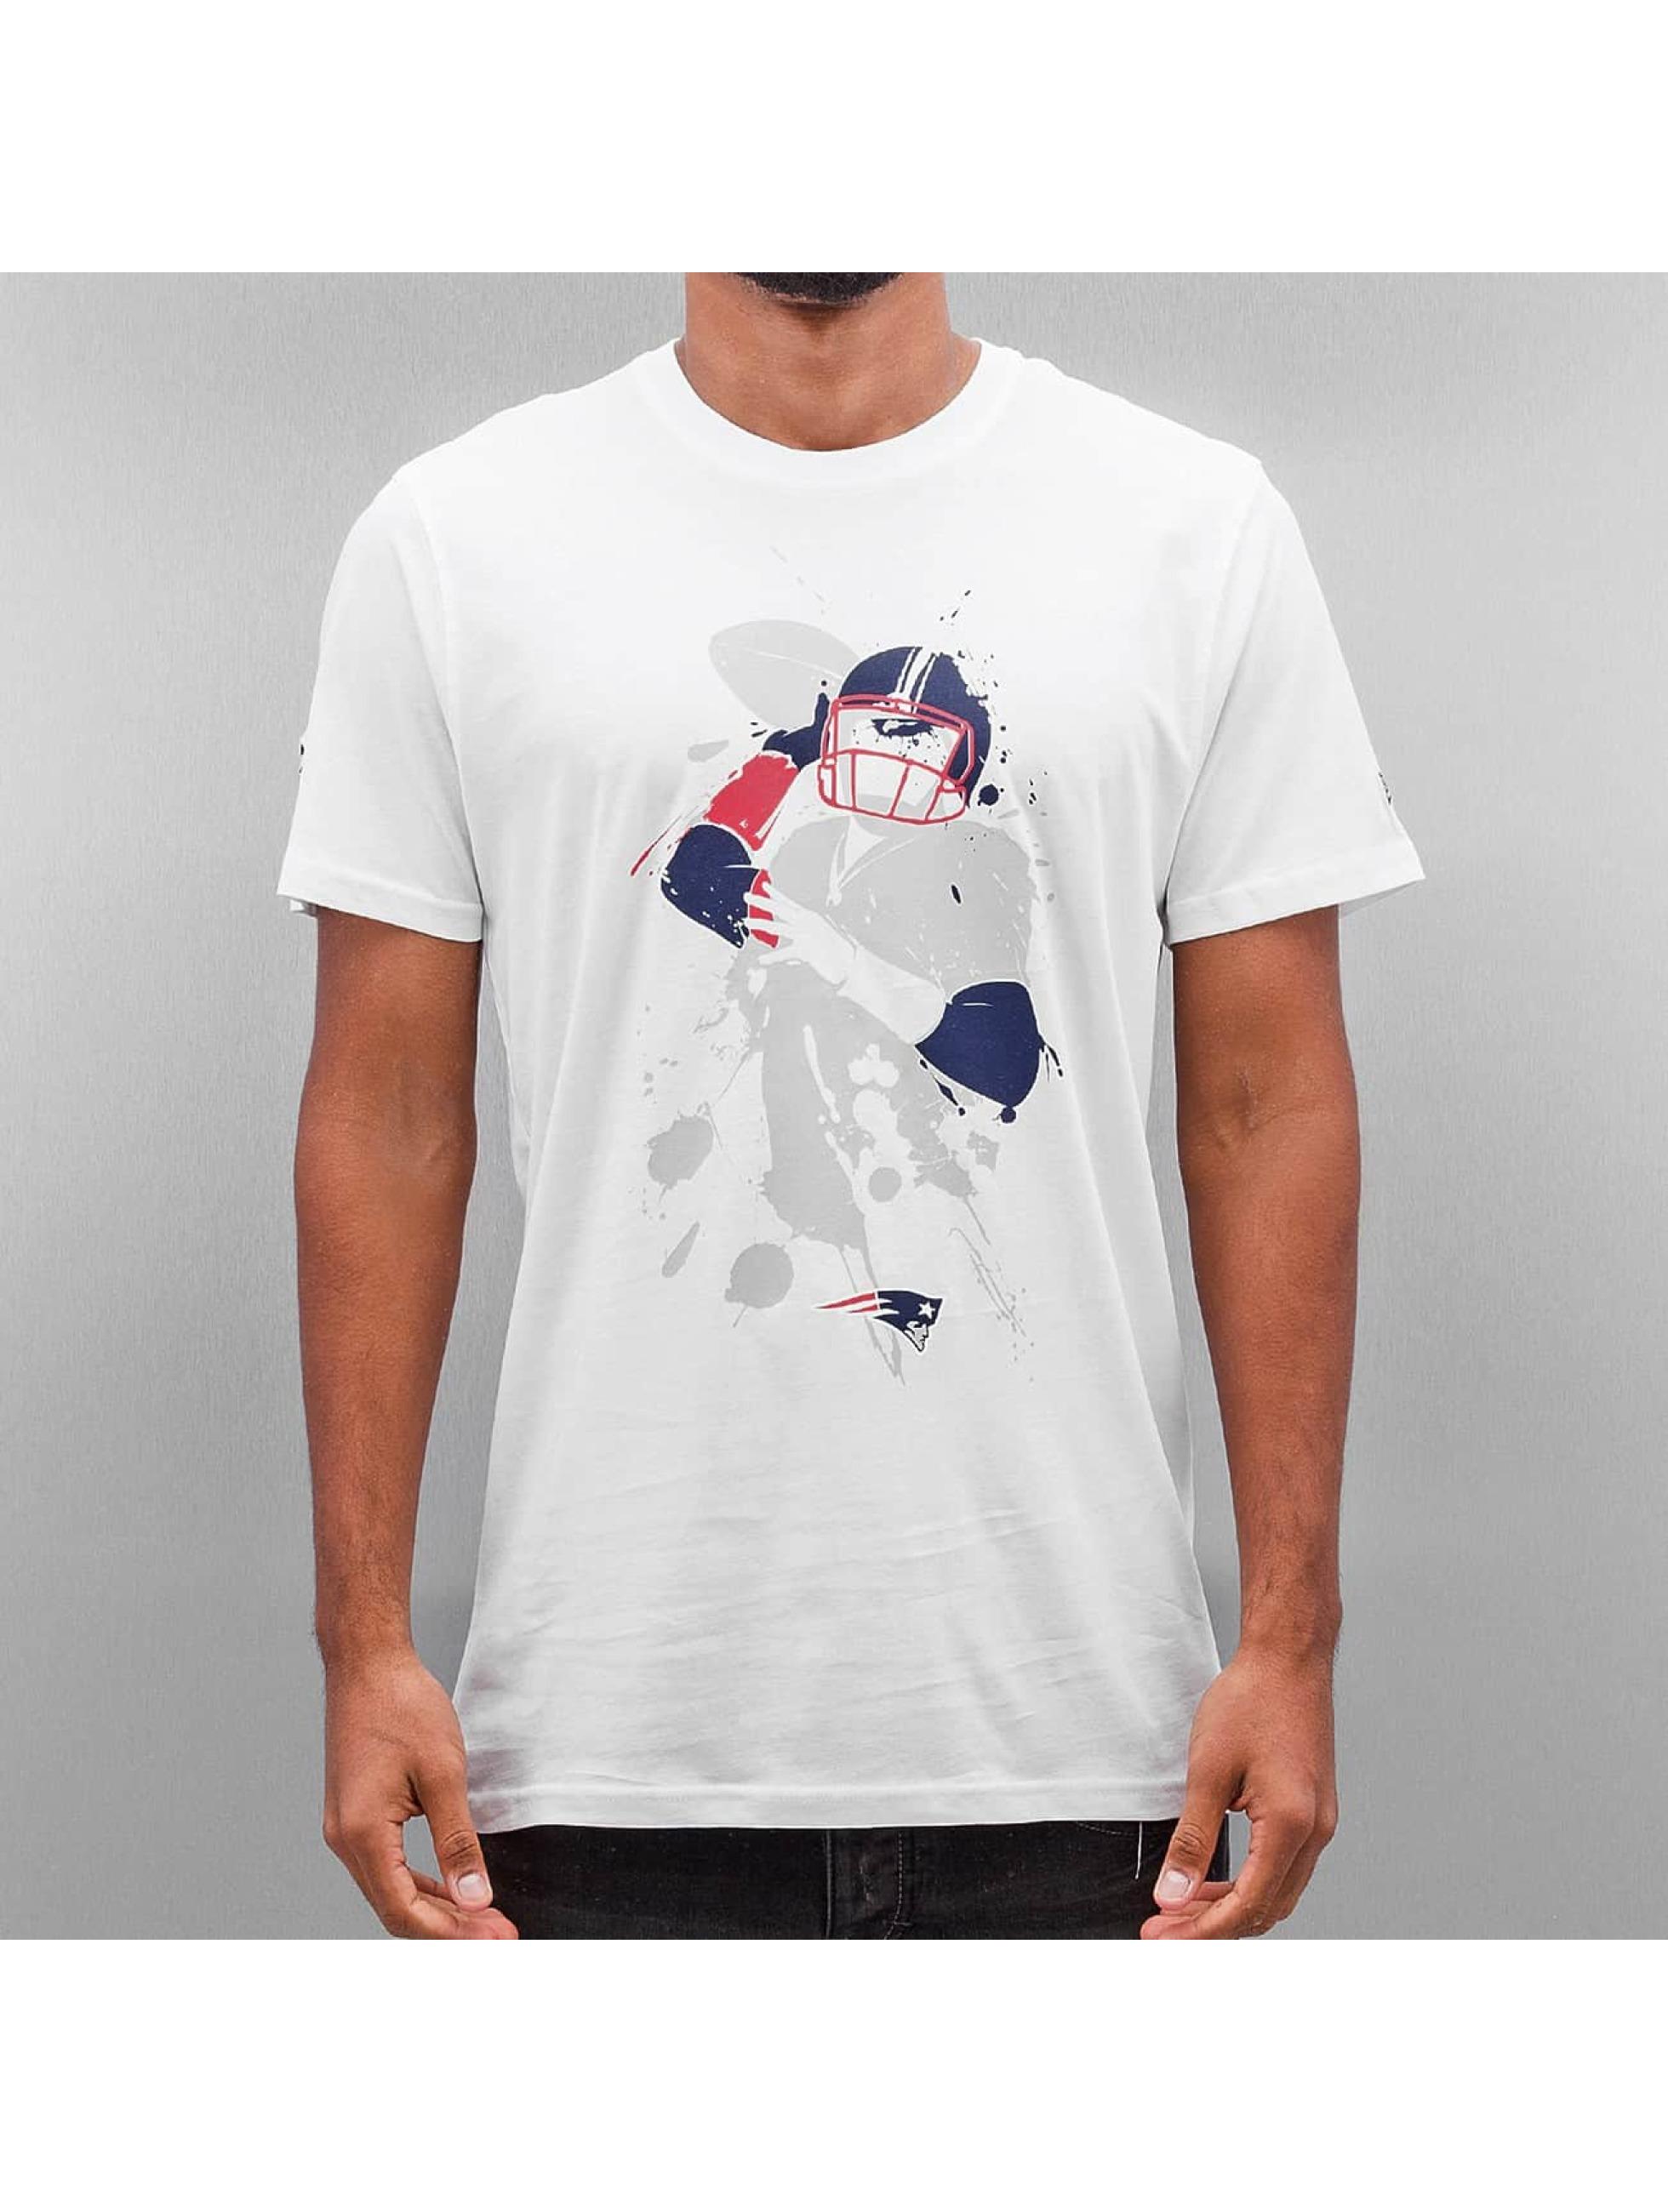 New Era Männer T-Shirt NFL Quarterback Splash England Patriots in weiß